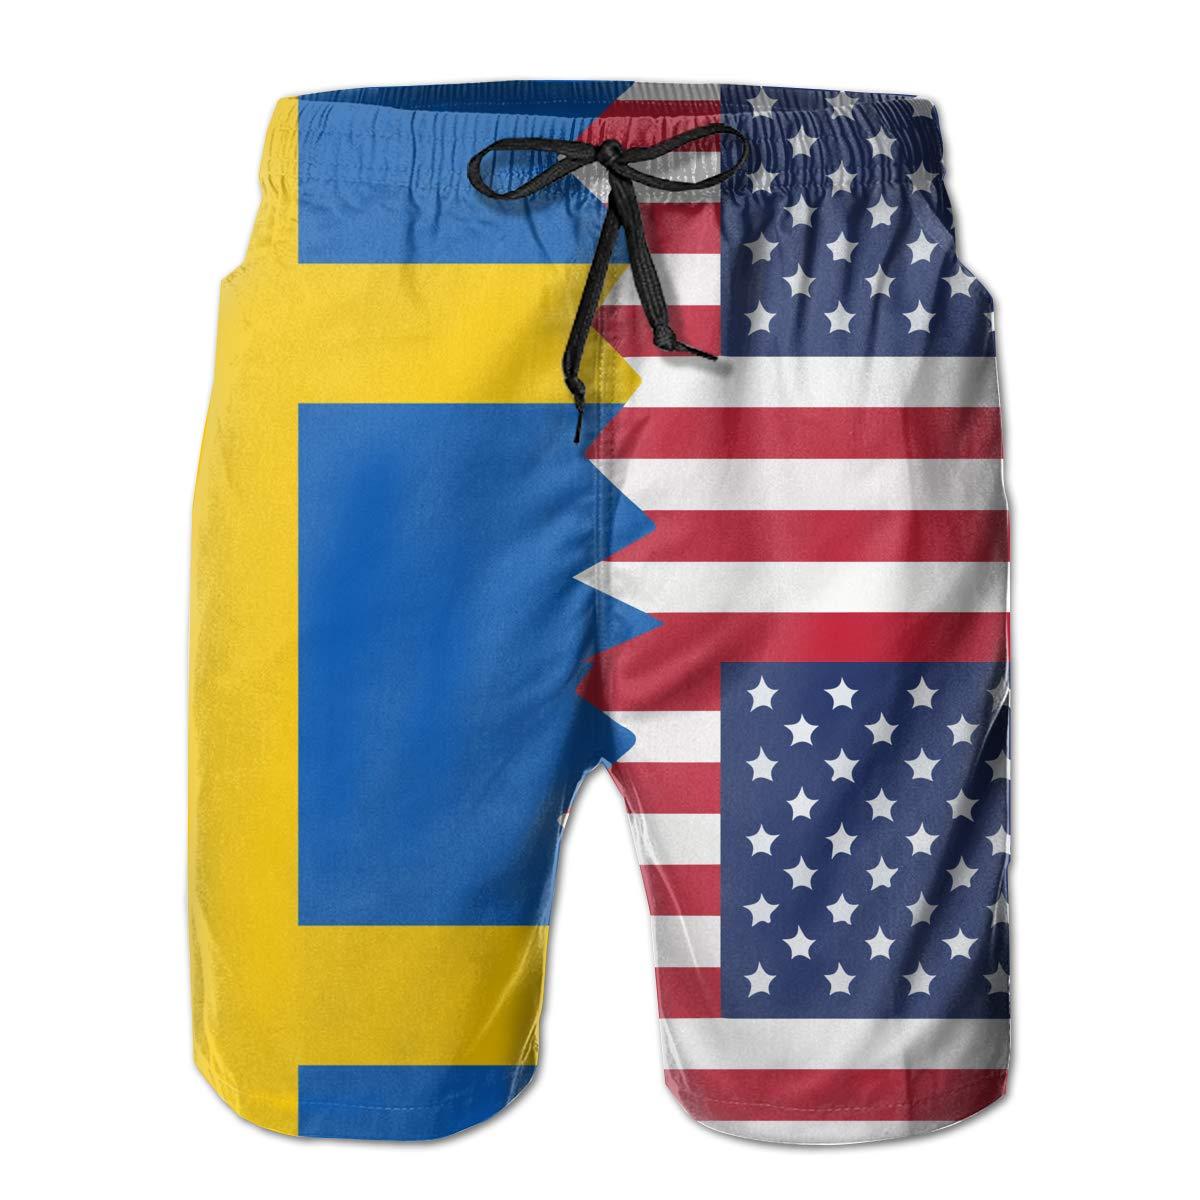 STDKNSK9 Mens Swedish USA Flag Board Shorts Beach Shorts